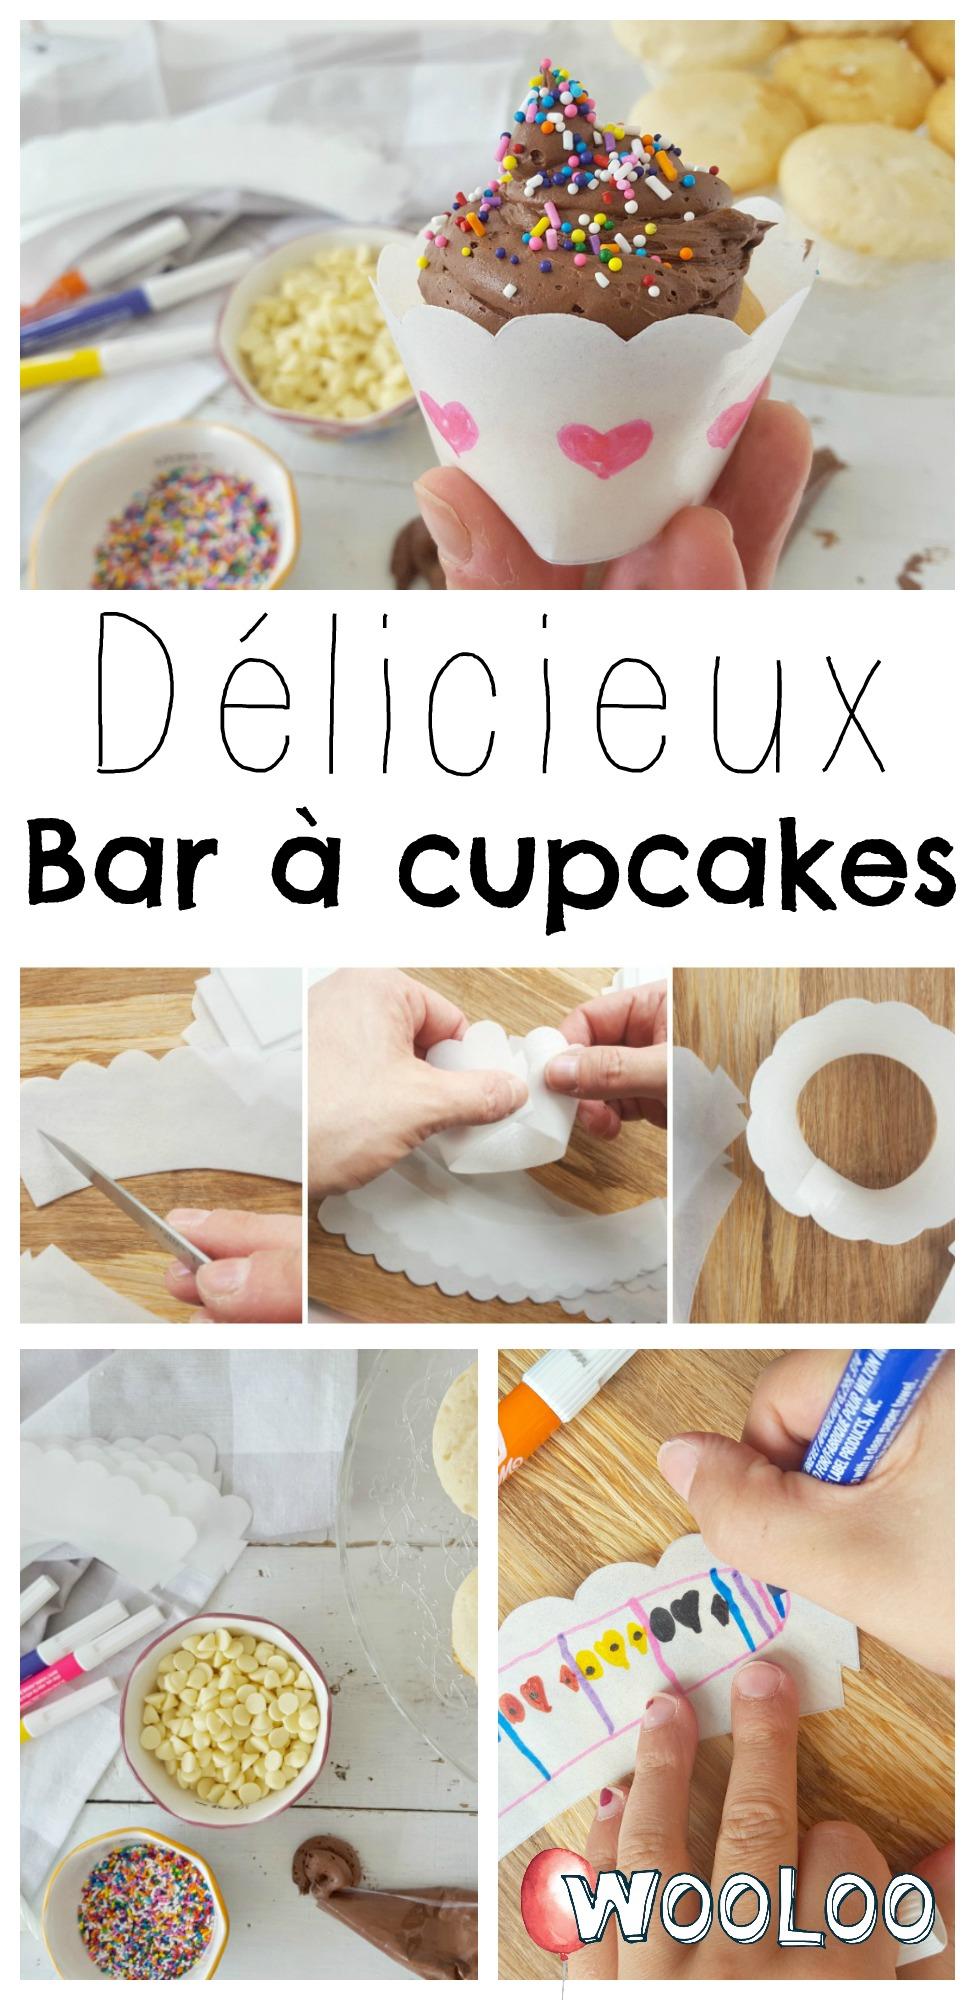 Wooloo cupcake bar